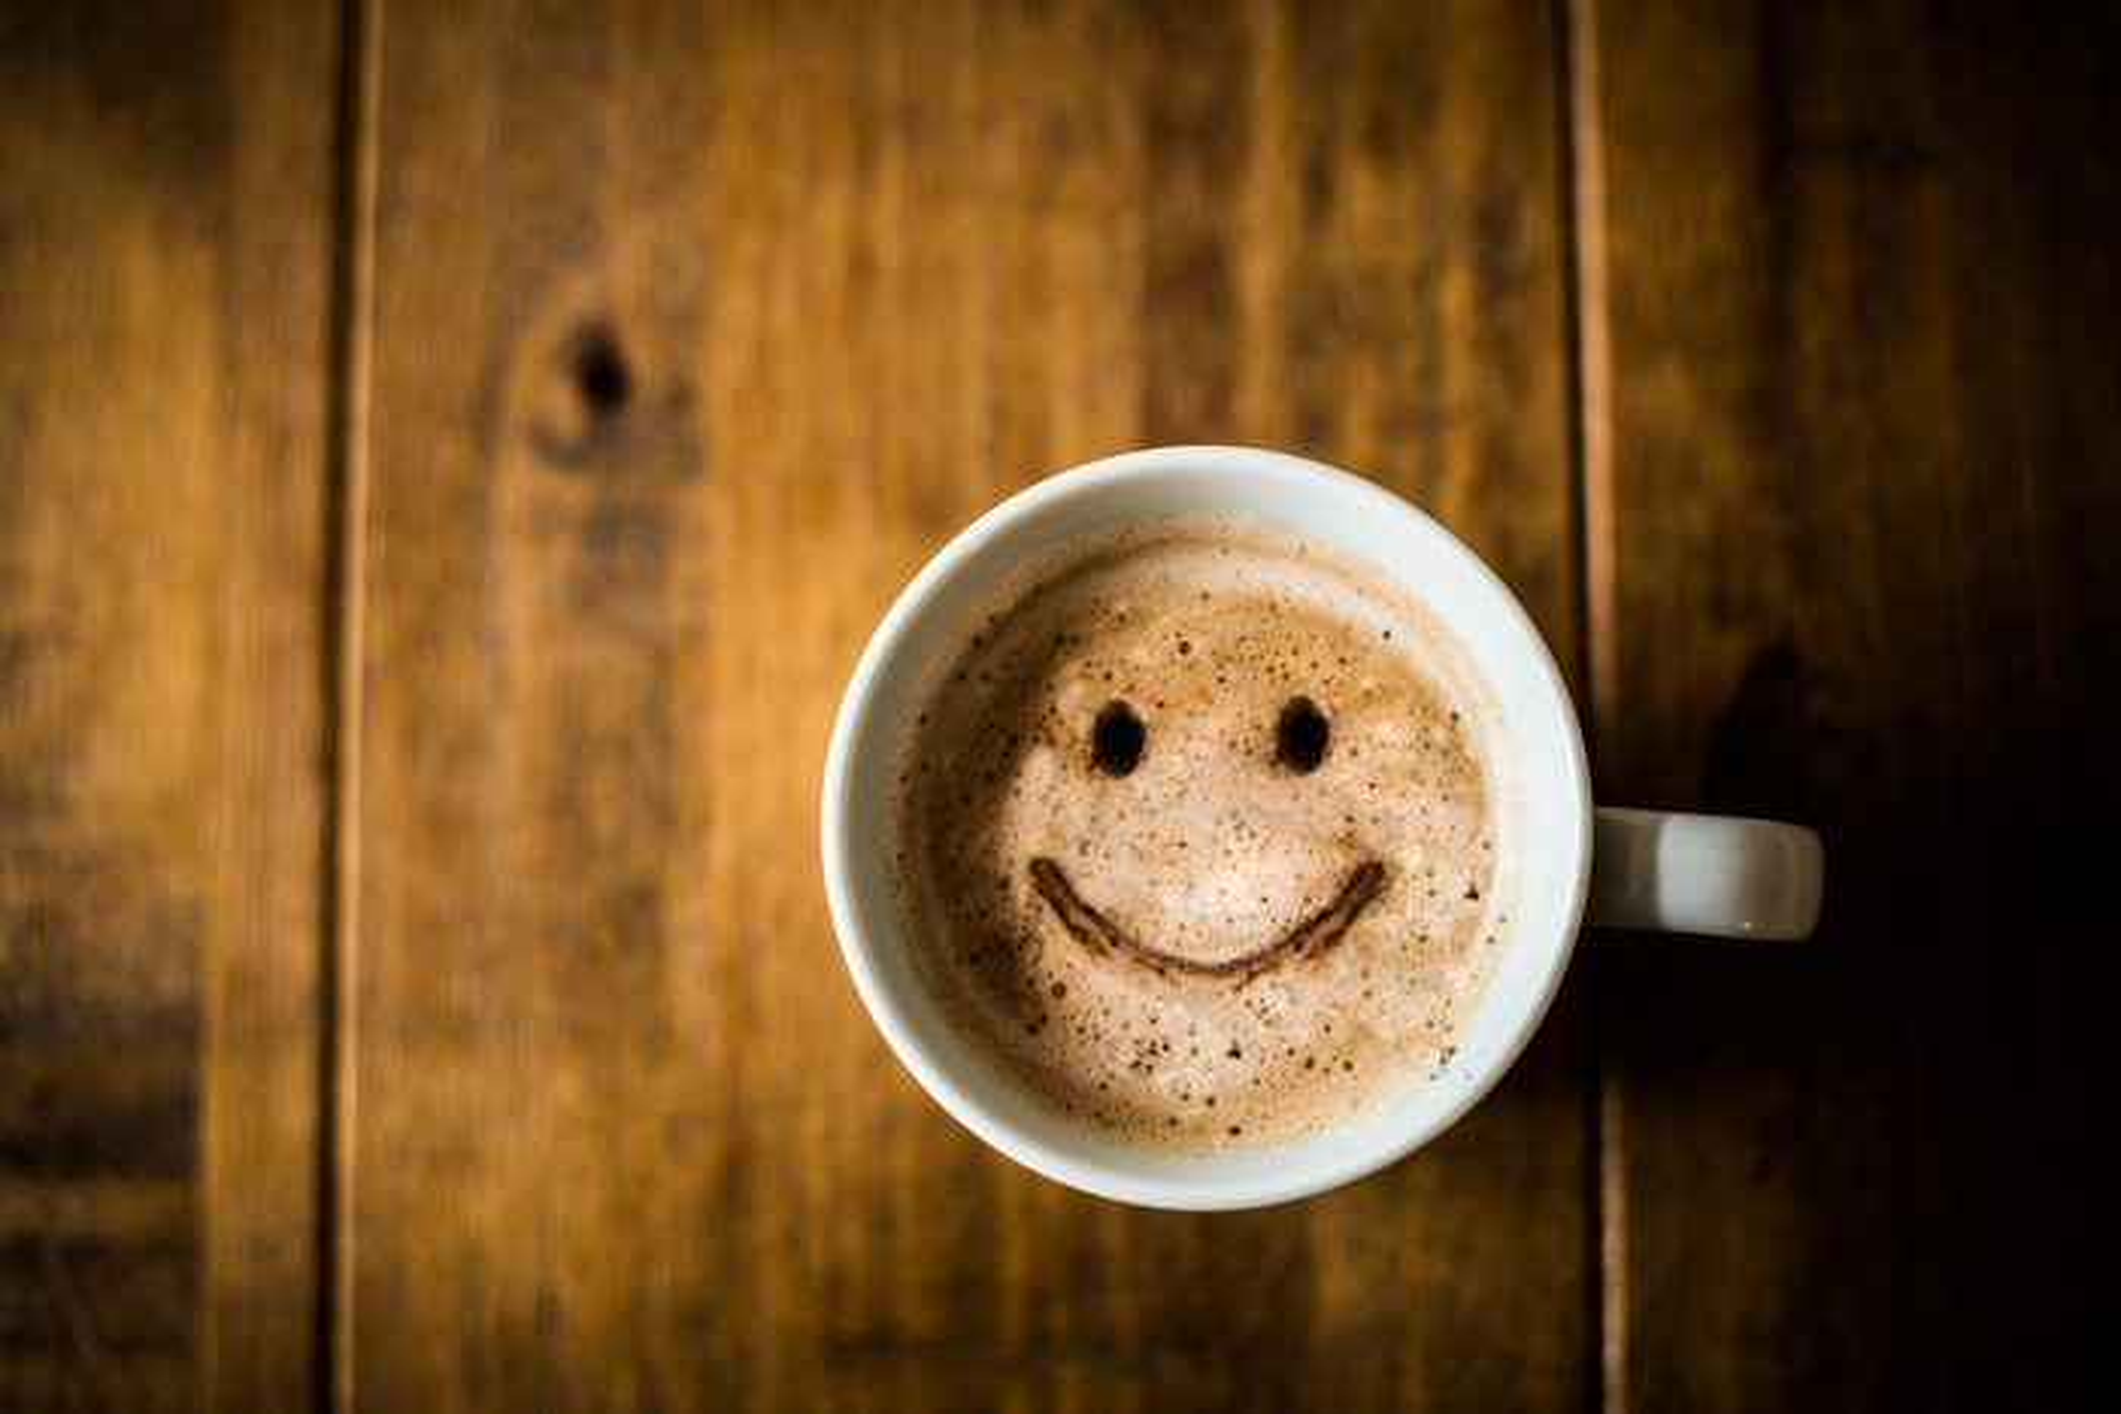 A coffee has a foam smiley face.